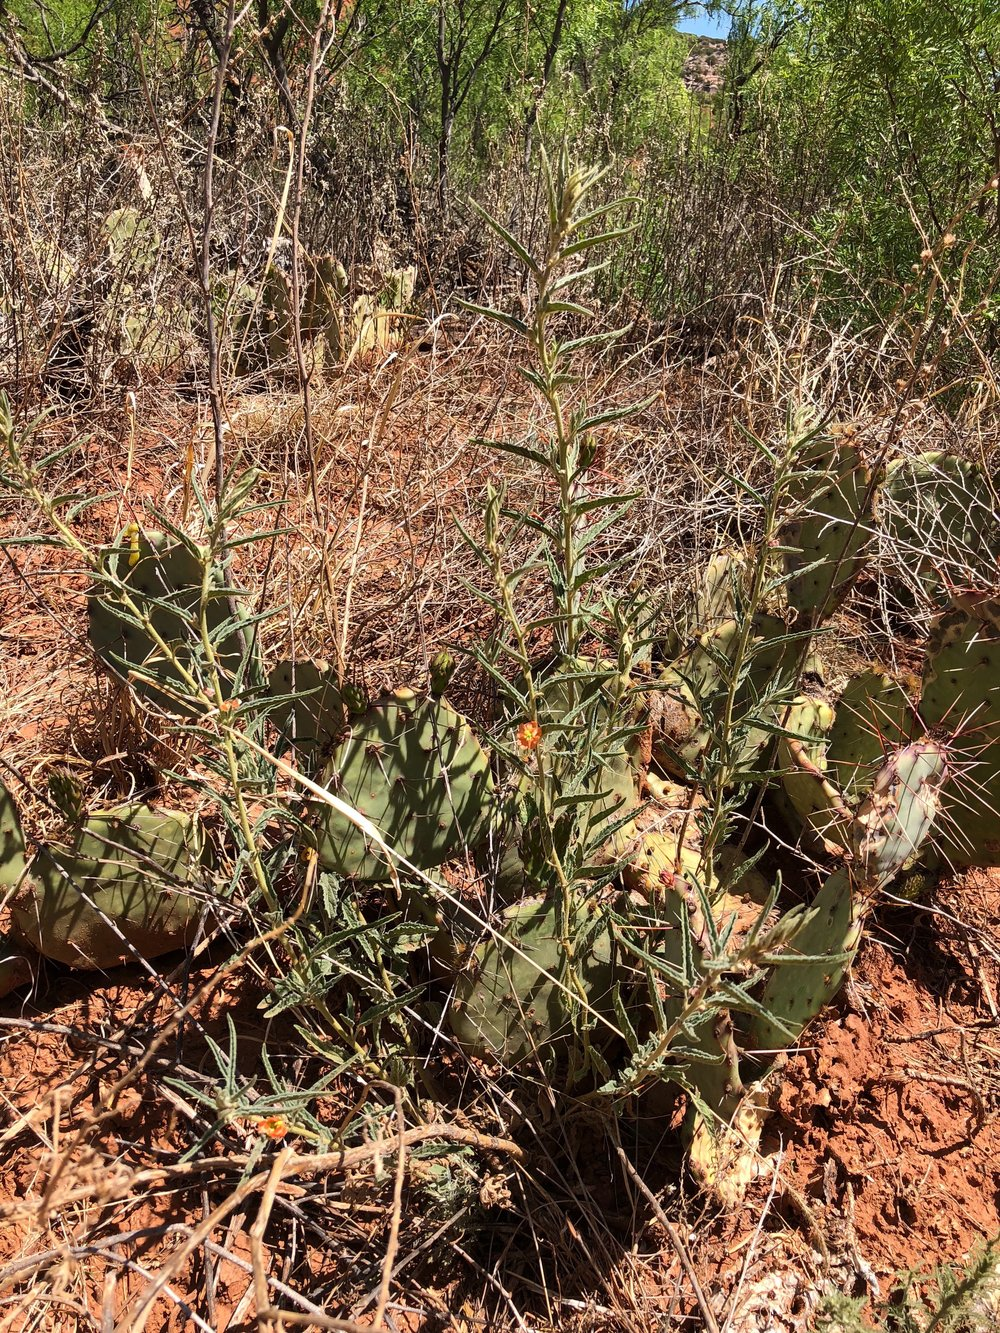 Sphaeralcea angustifolia, Narrowleaf Globemallow